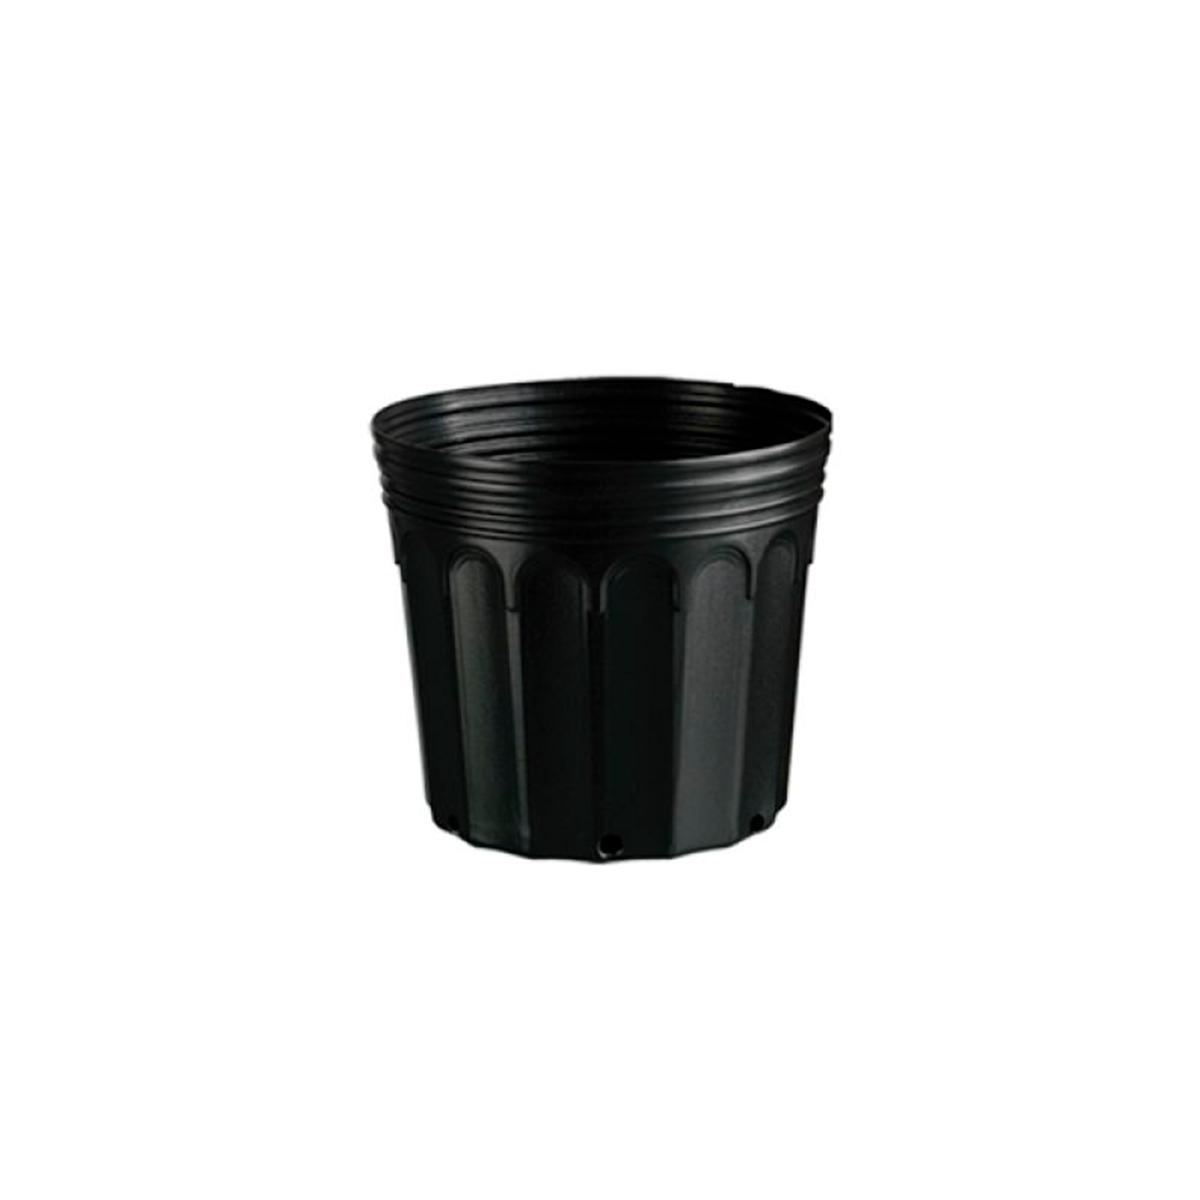 Kit 5 Embalagem para Mudas Flexível Plástico 8,5L